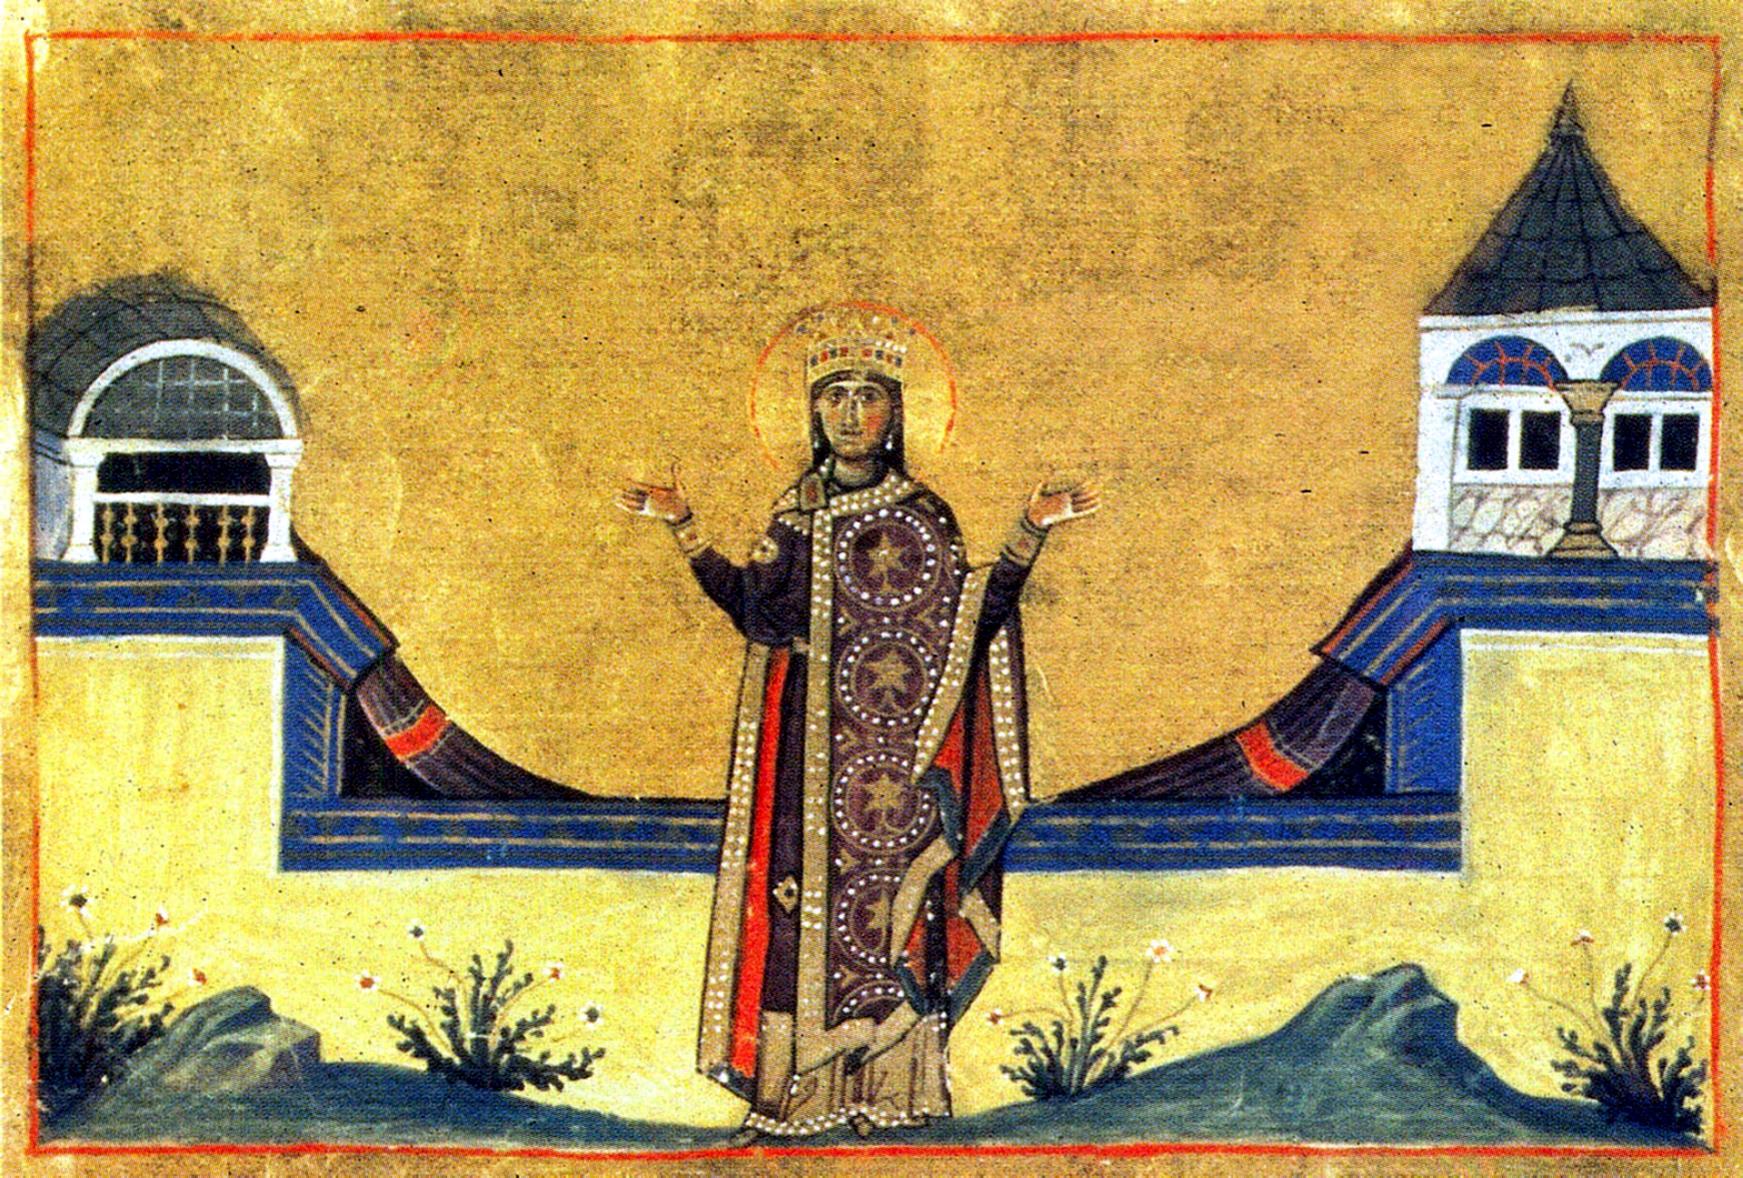 Theophano Martiniake